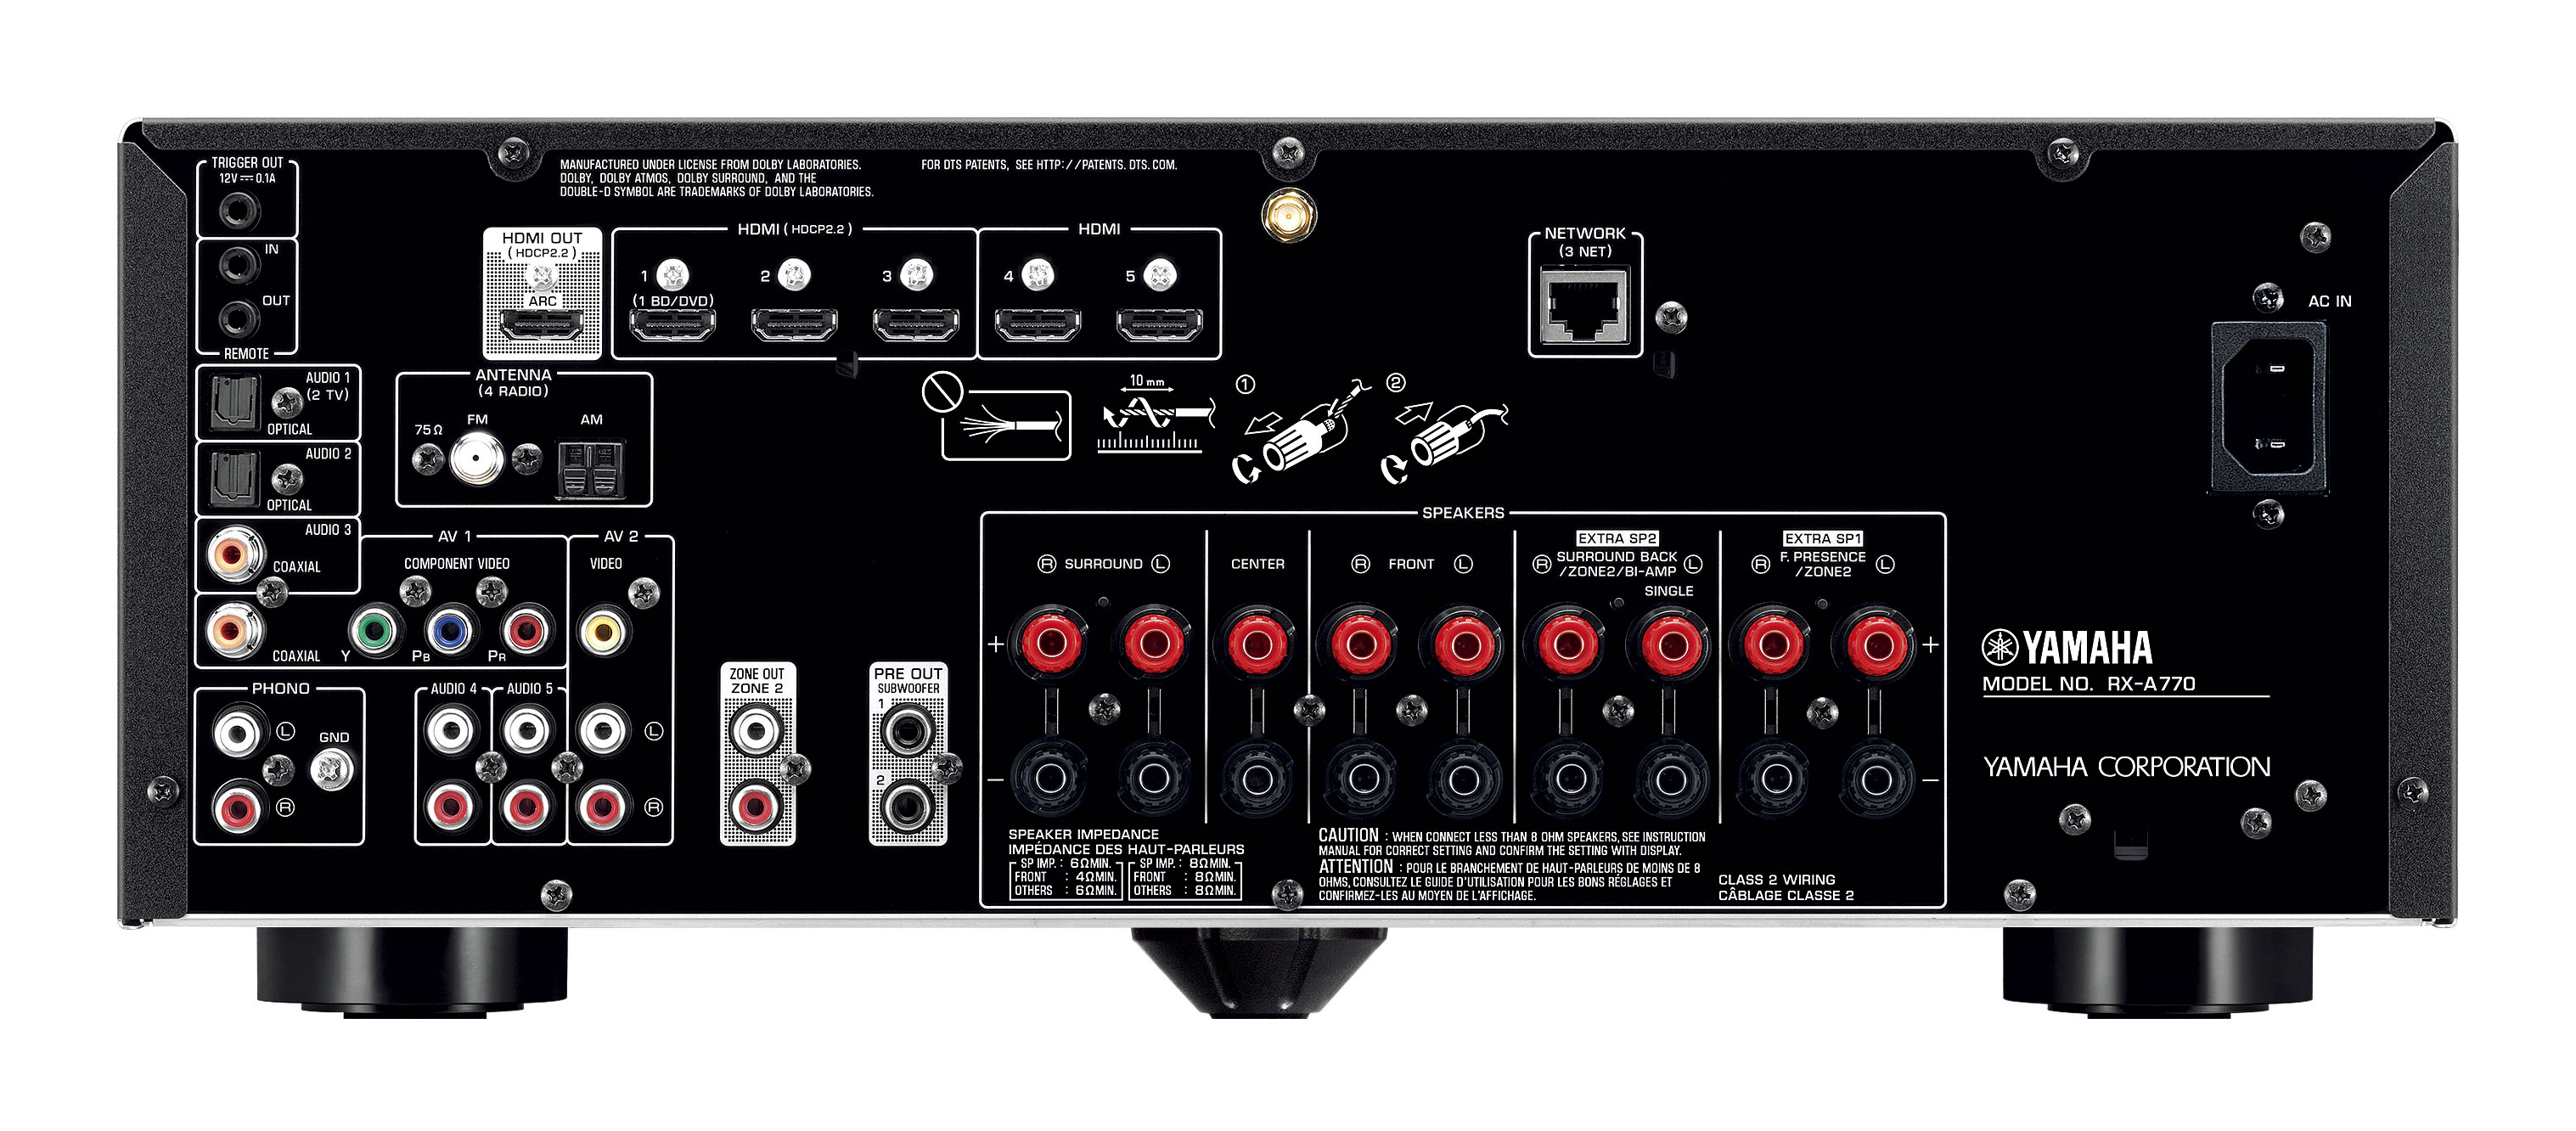 Yamaha Aventage Rx A770 7 2 Channel Av Receiver 90w X 7